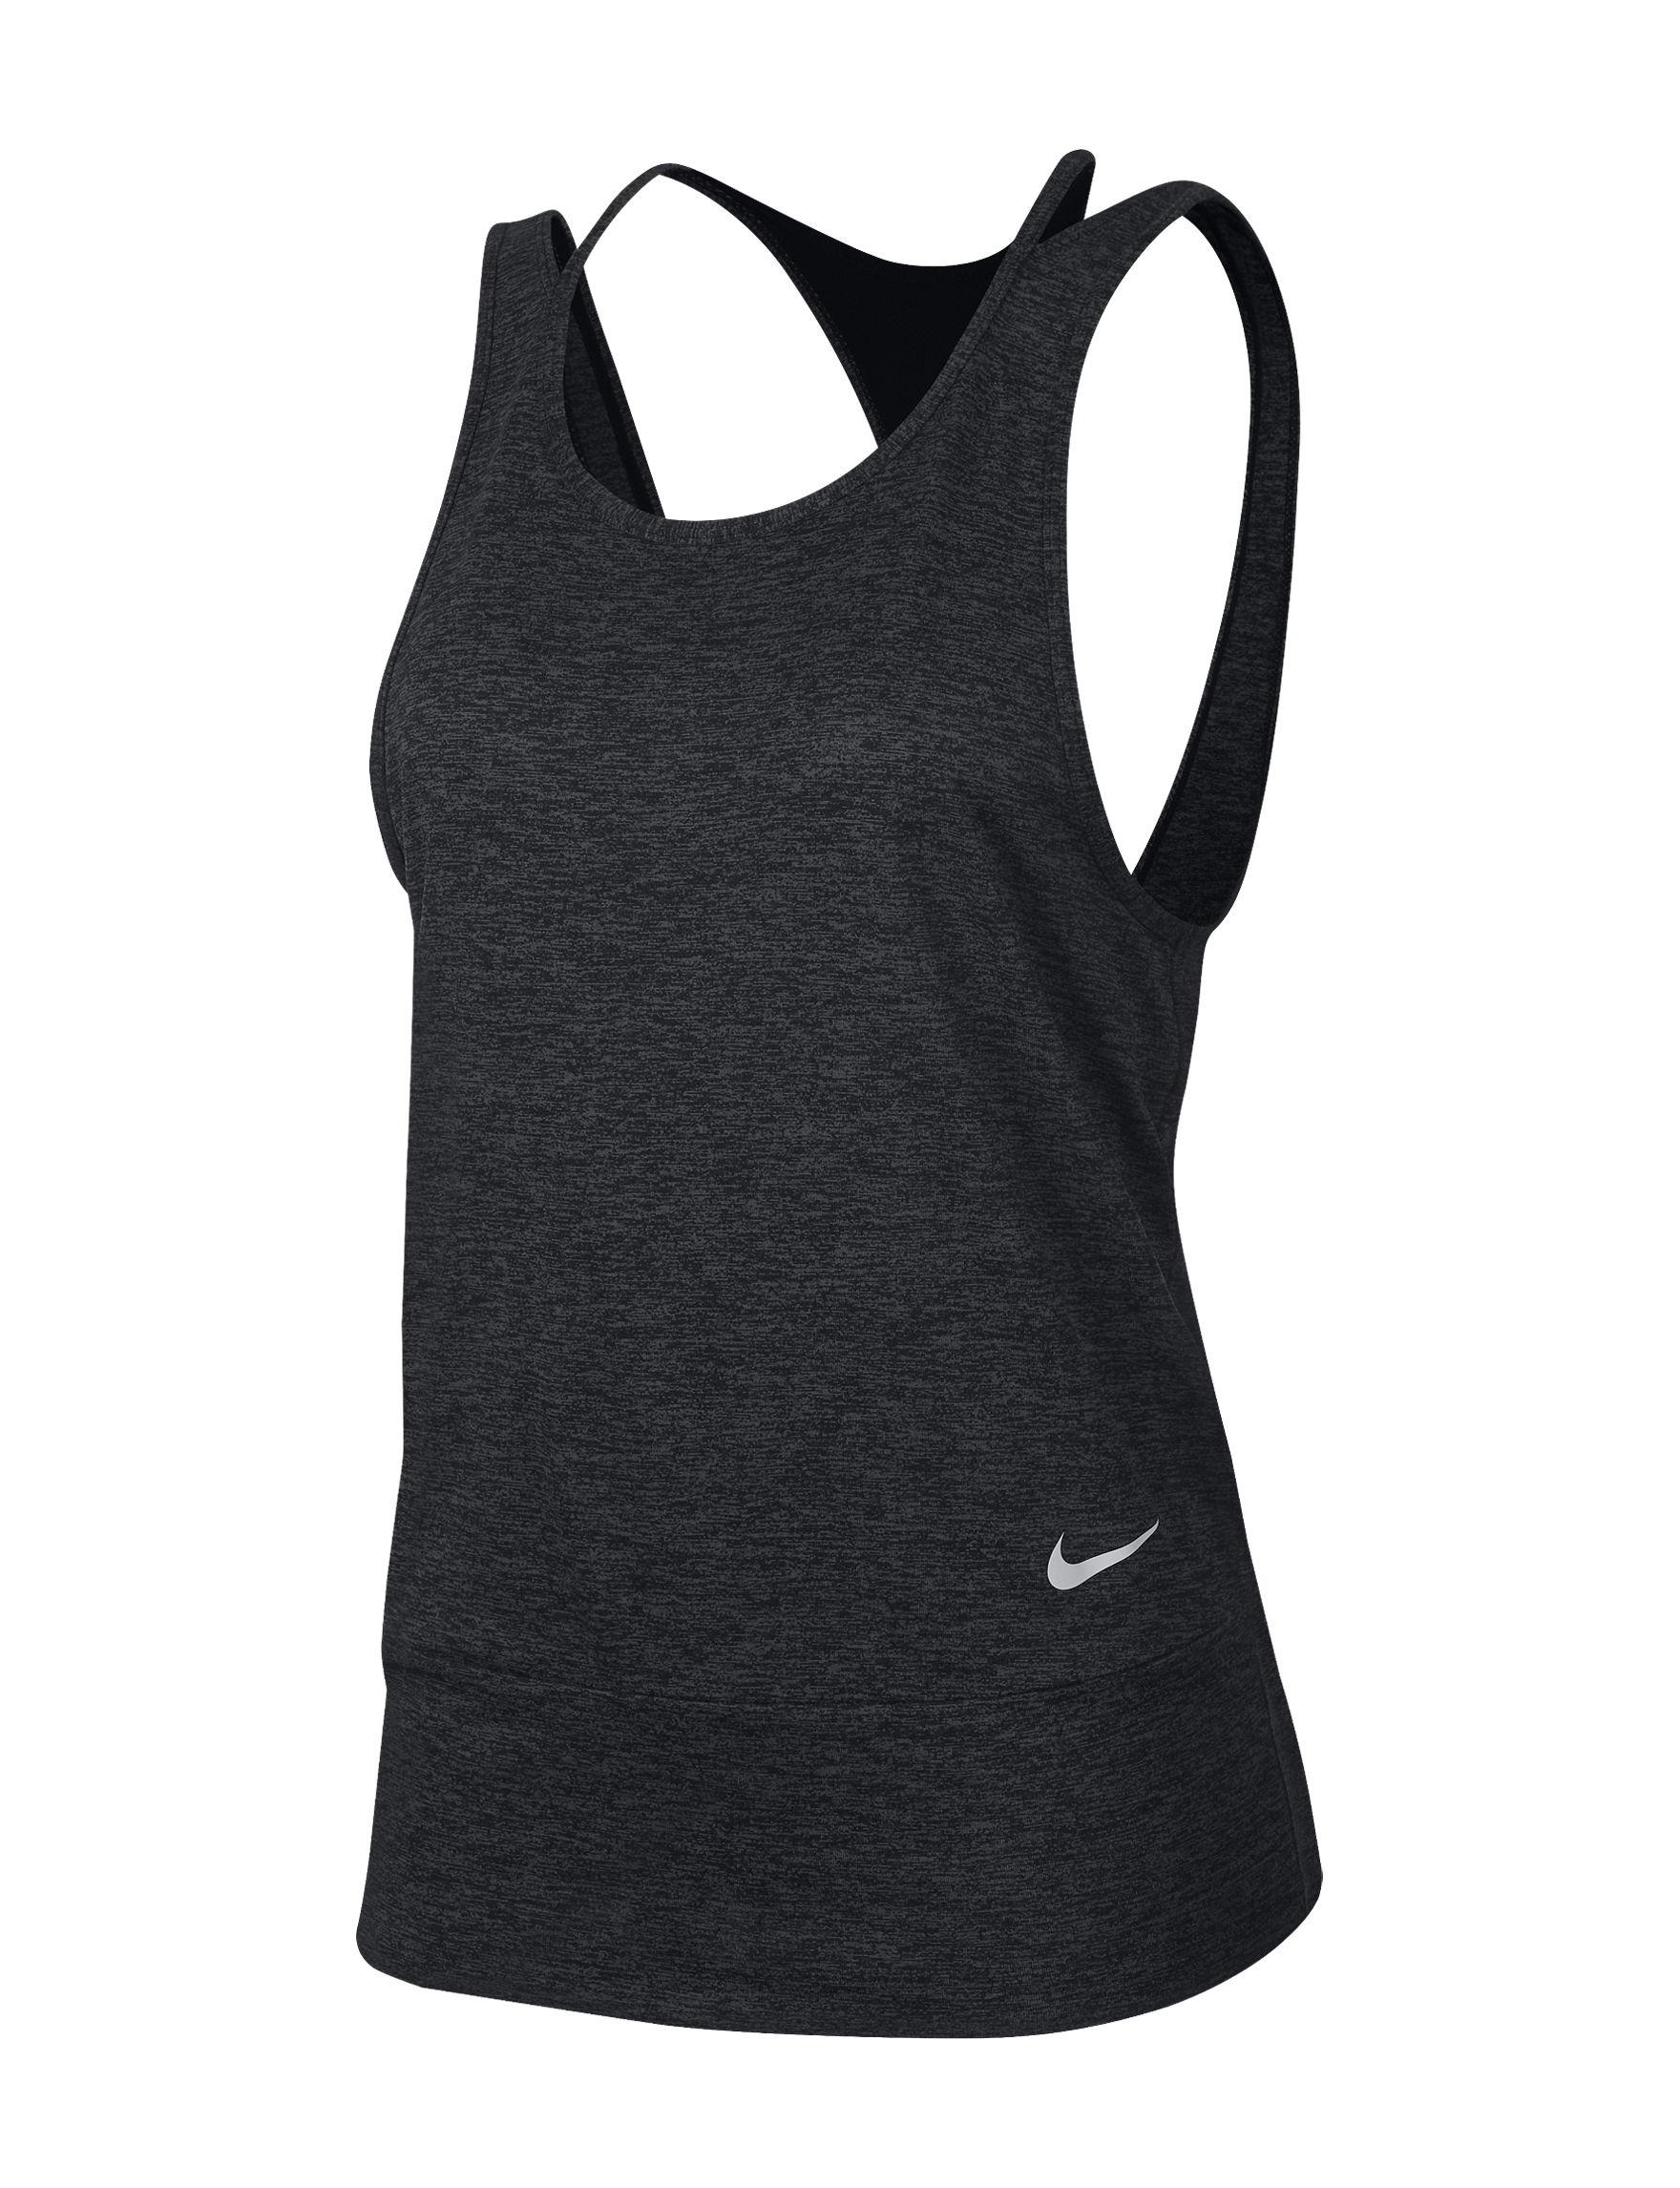 Nike Dark Grey Tees & Tanks